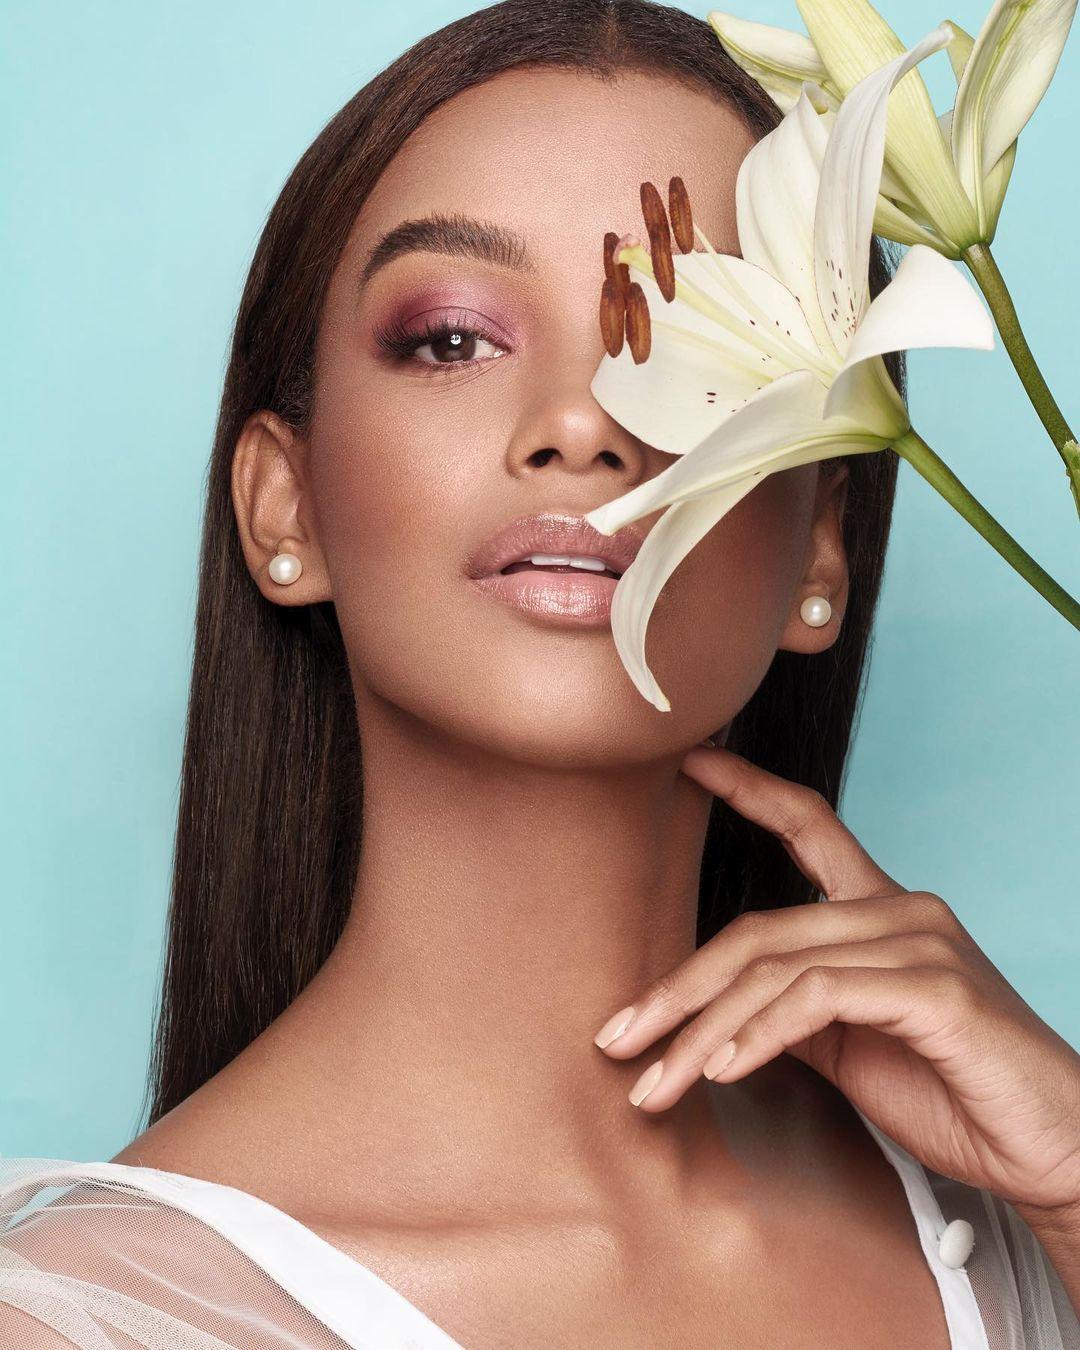 carolina londono, top 16 de miss colombia universo 2020. Carolo13